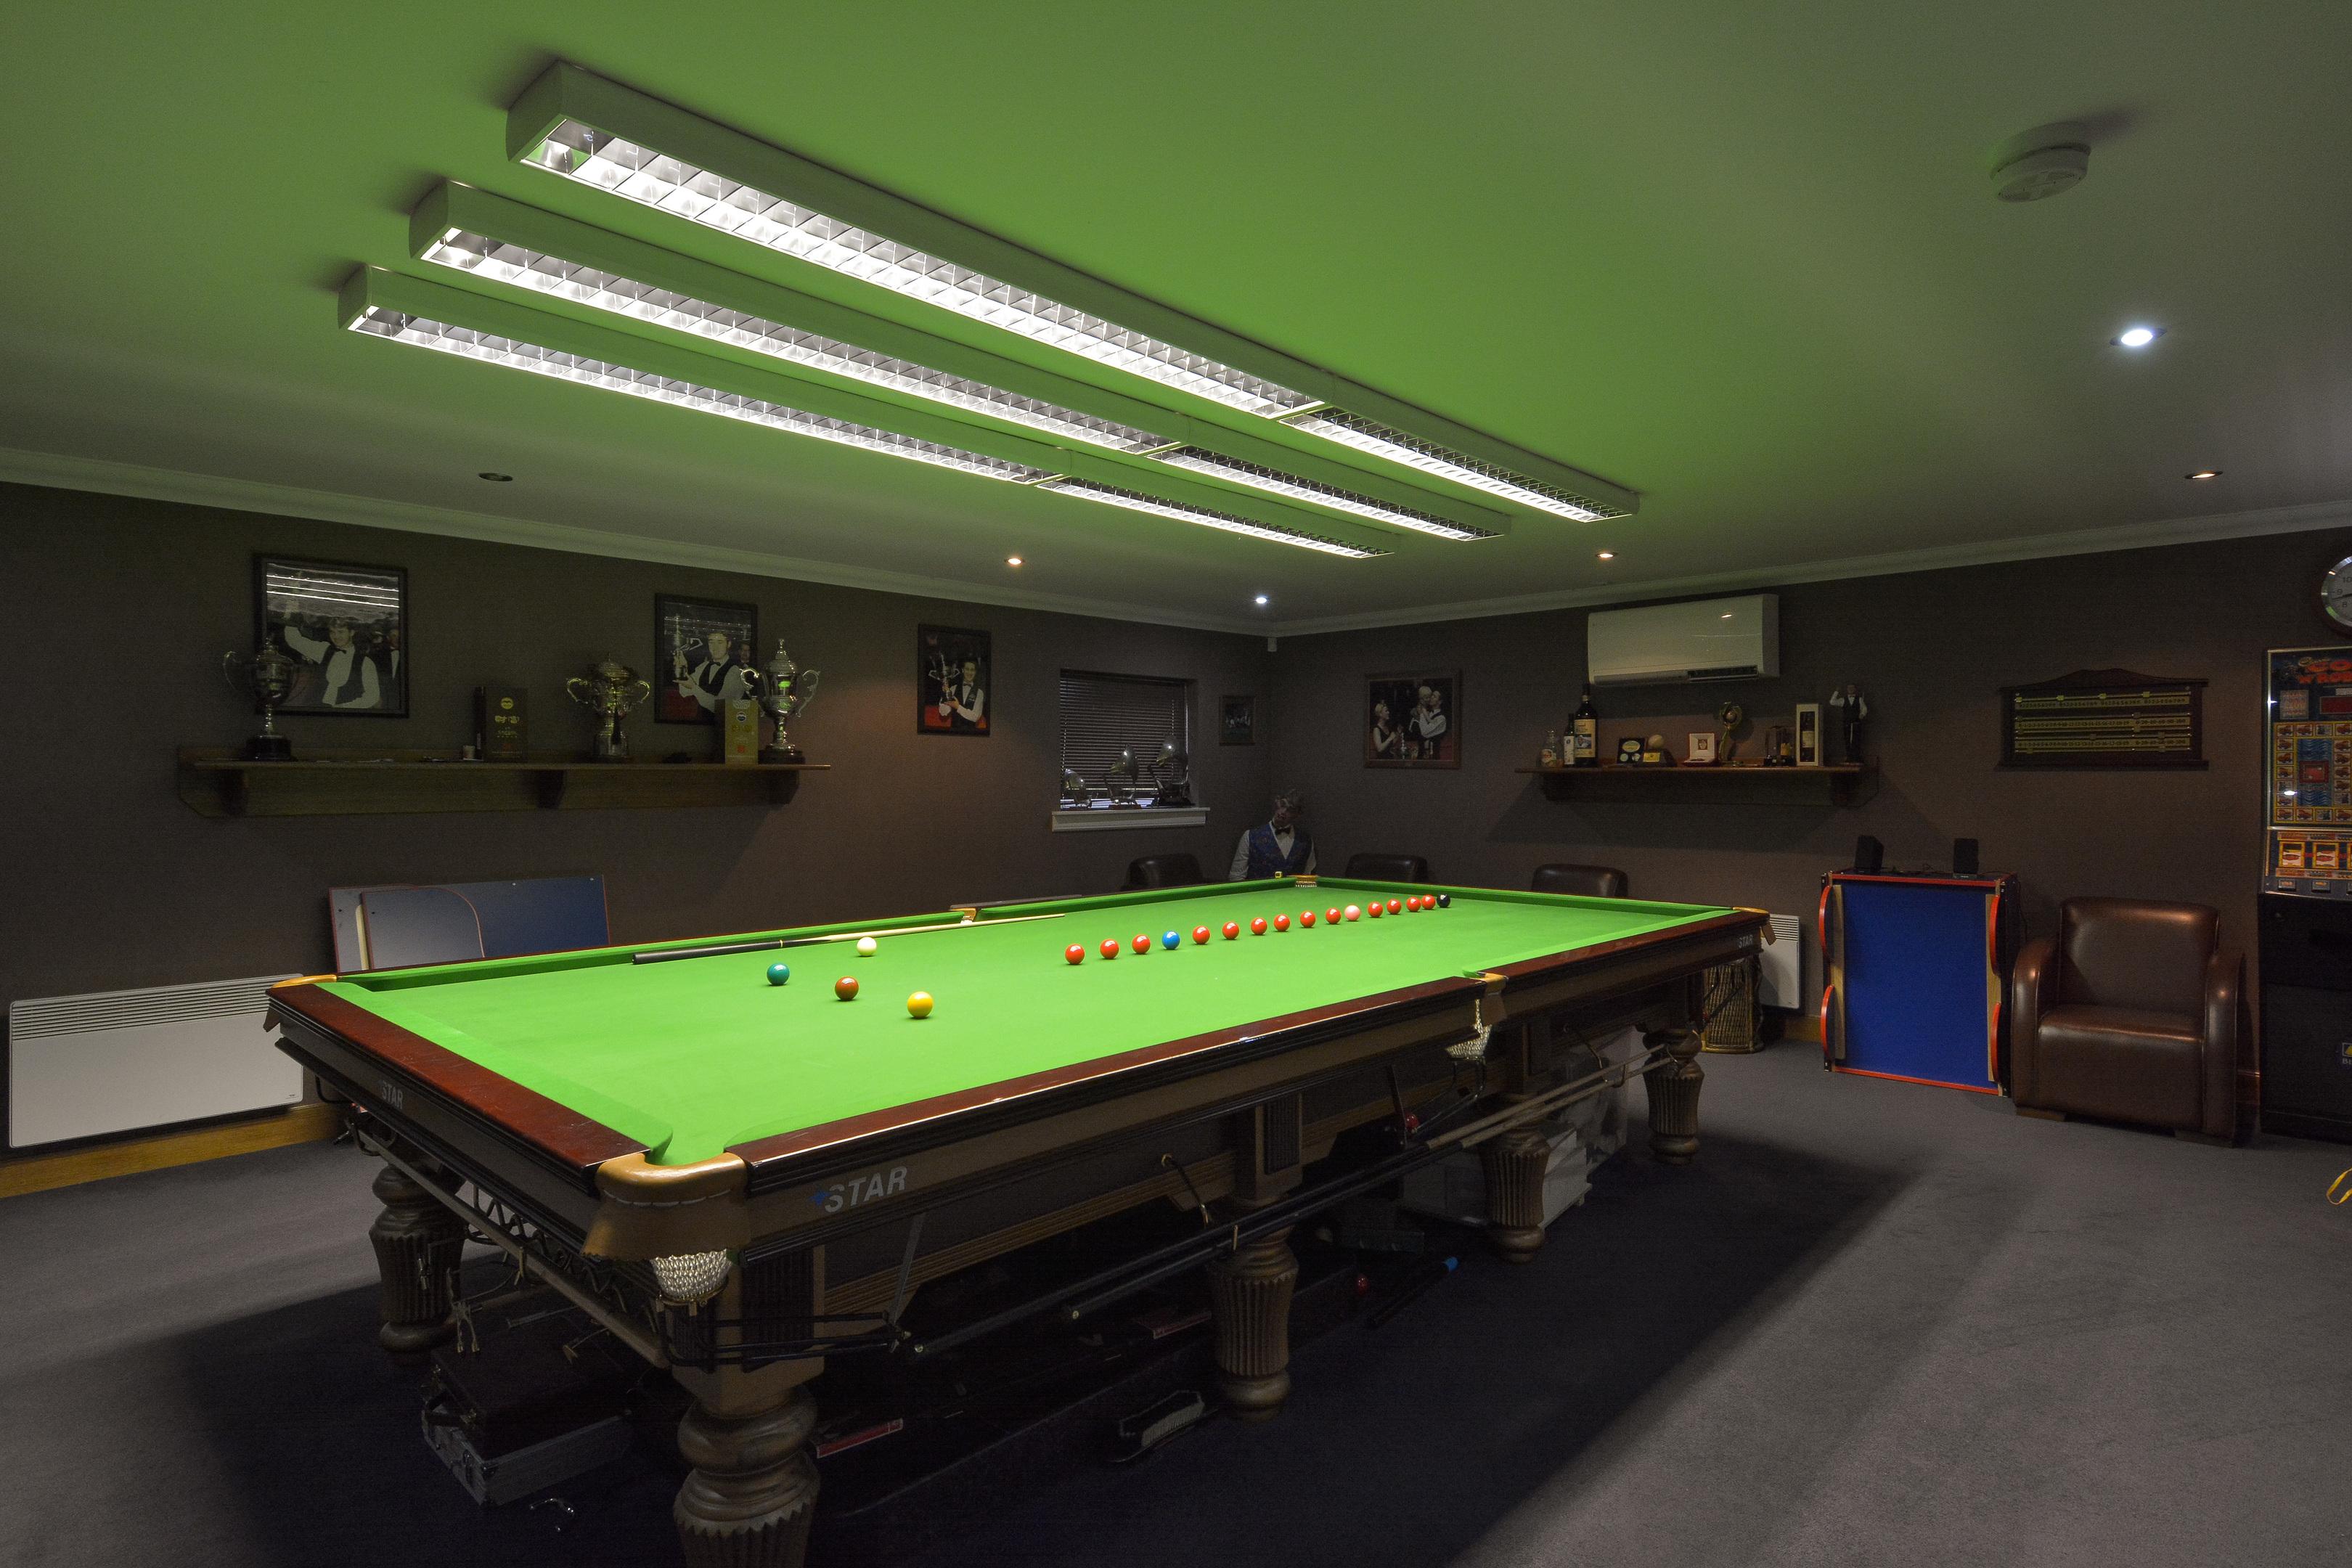 Stephen's old snooker room.